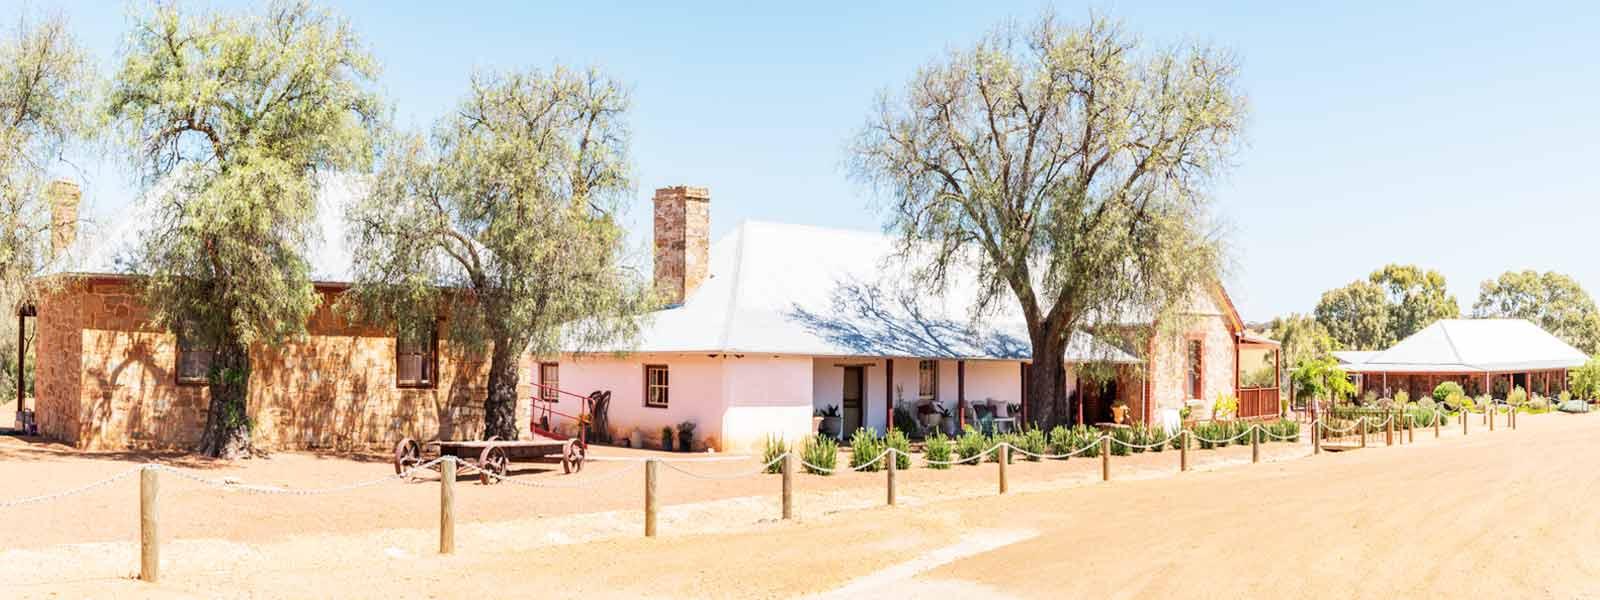 historic-slater-homestead-goomalling